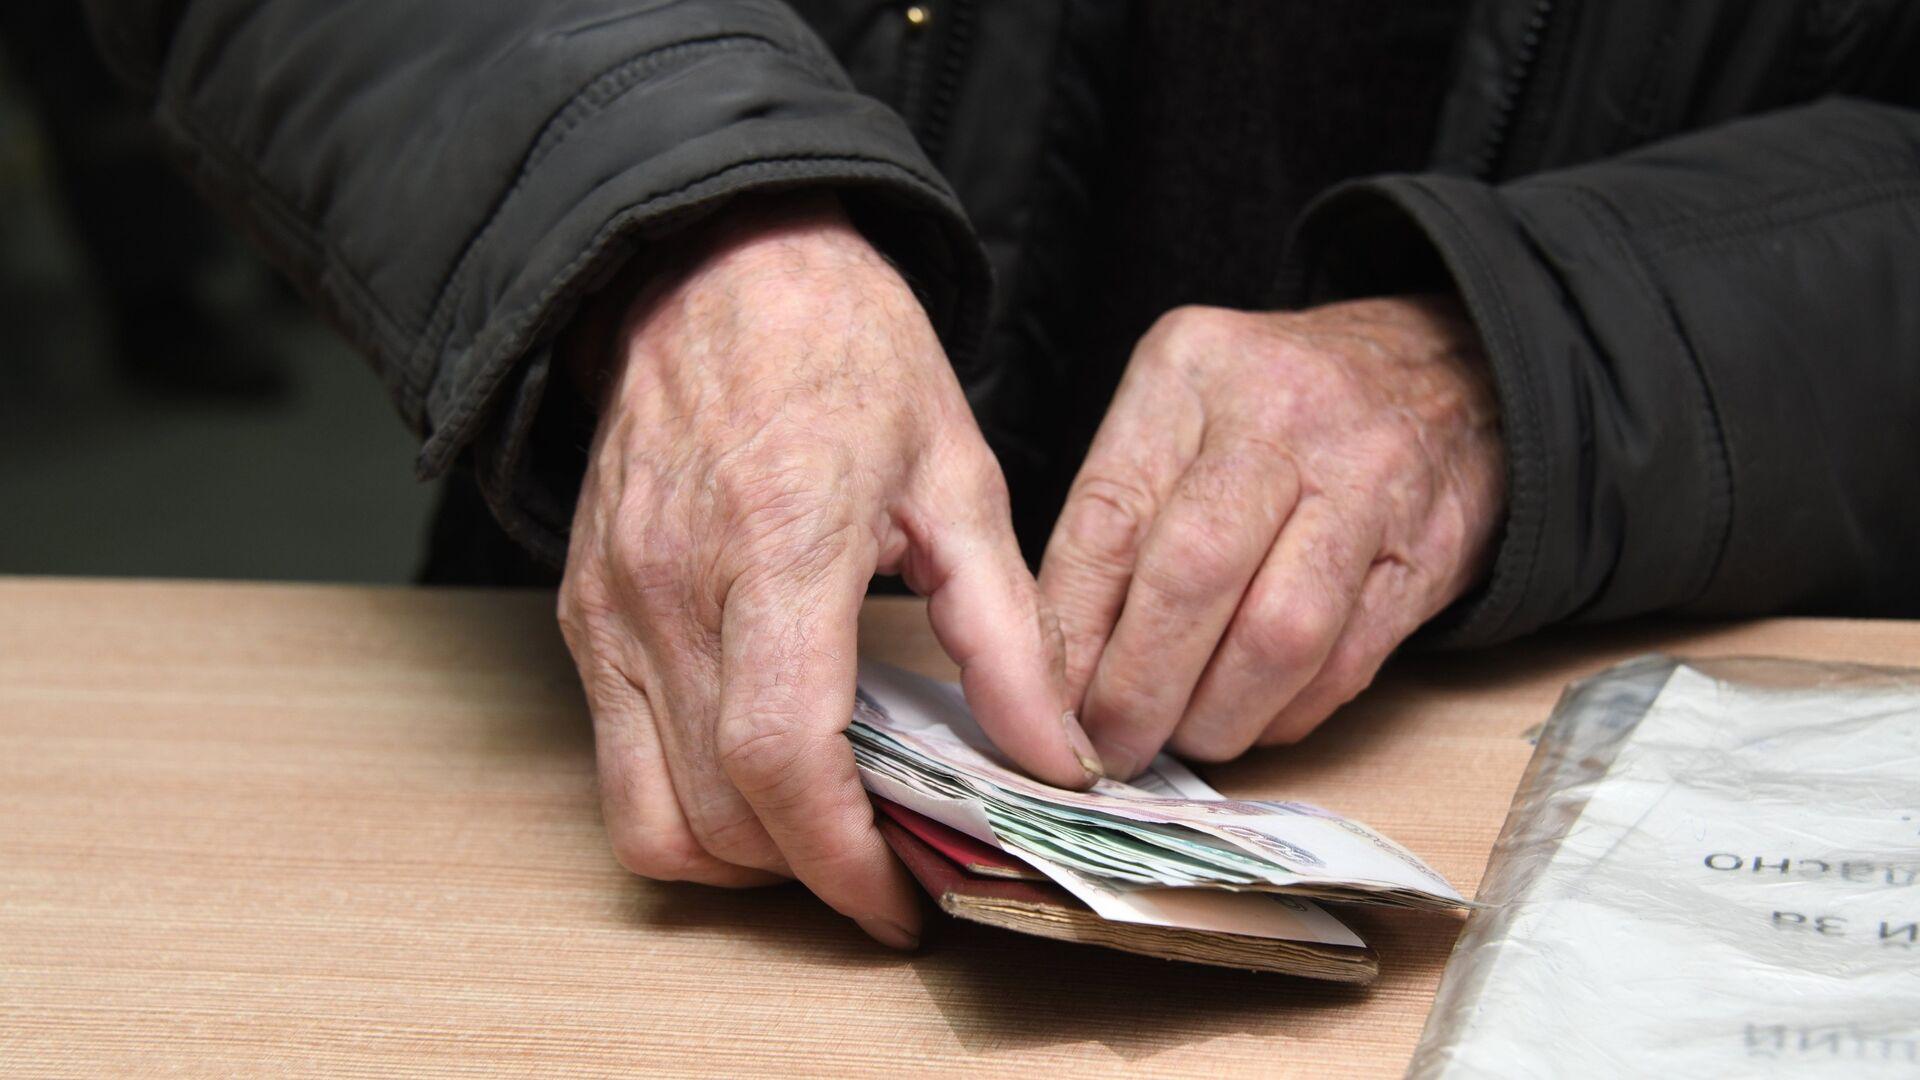 Мужчина с полученной пенсией - РИА Новости, 1920, 01.12.2020